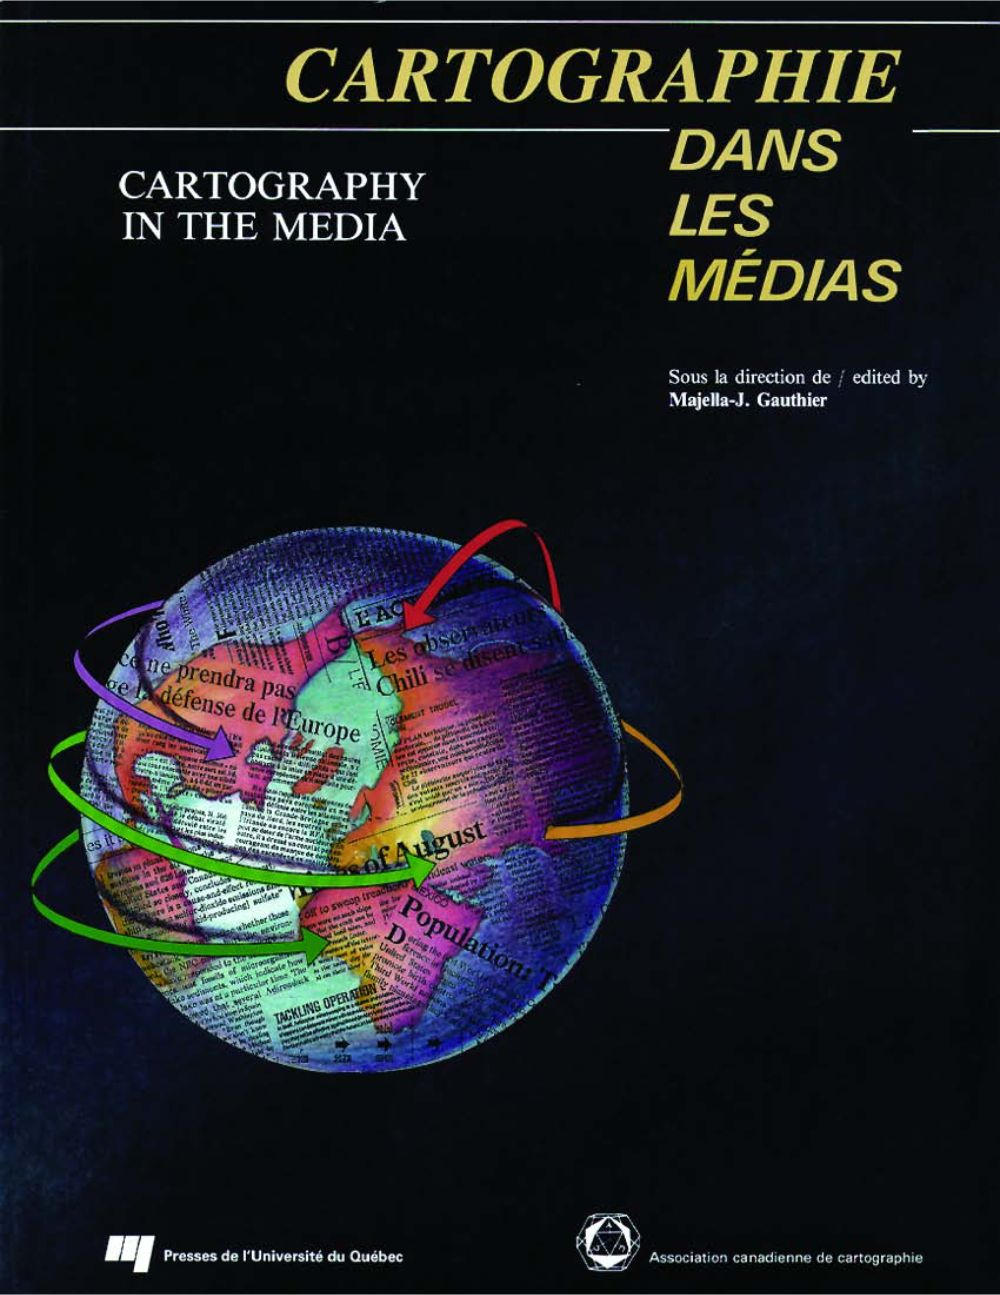 Cartographie dans les médias / Cartography in the media